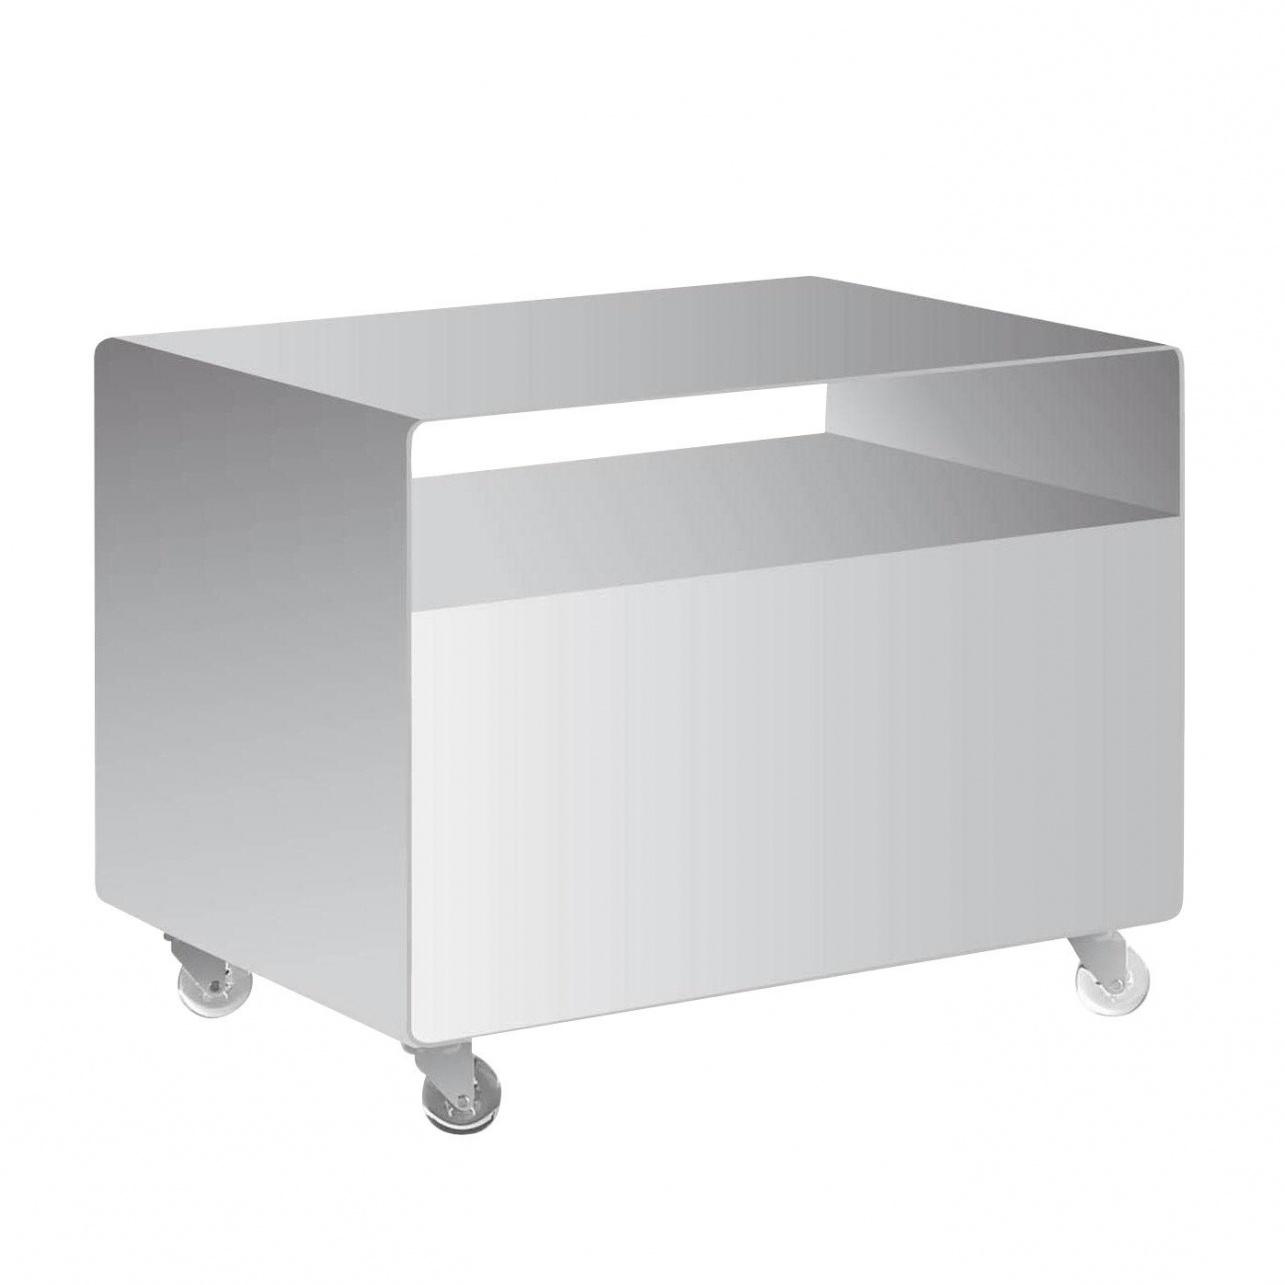 home design nightstand with drawers elegant timmy accent table muller mobelfabrikation mobile line rollwagen mit klapptur black drawer mosaic end garden bar ideas round wicker